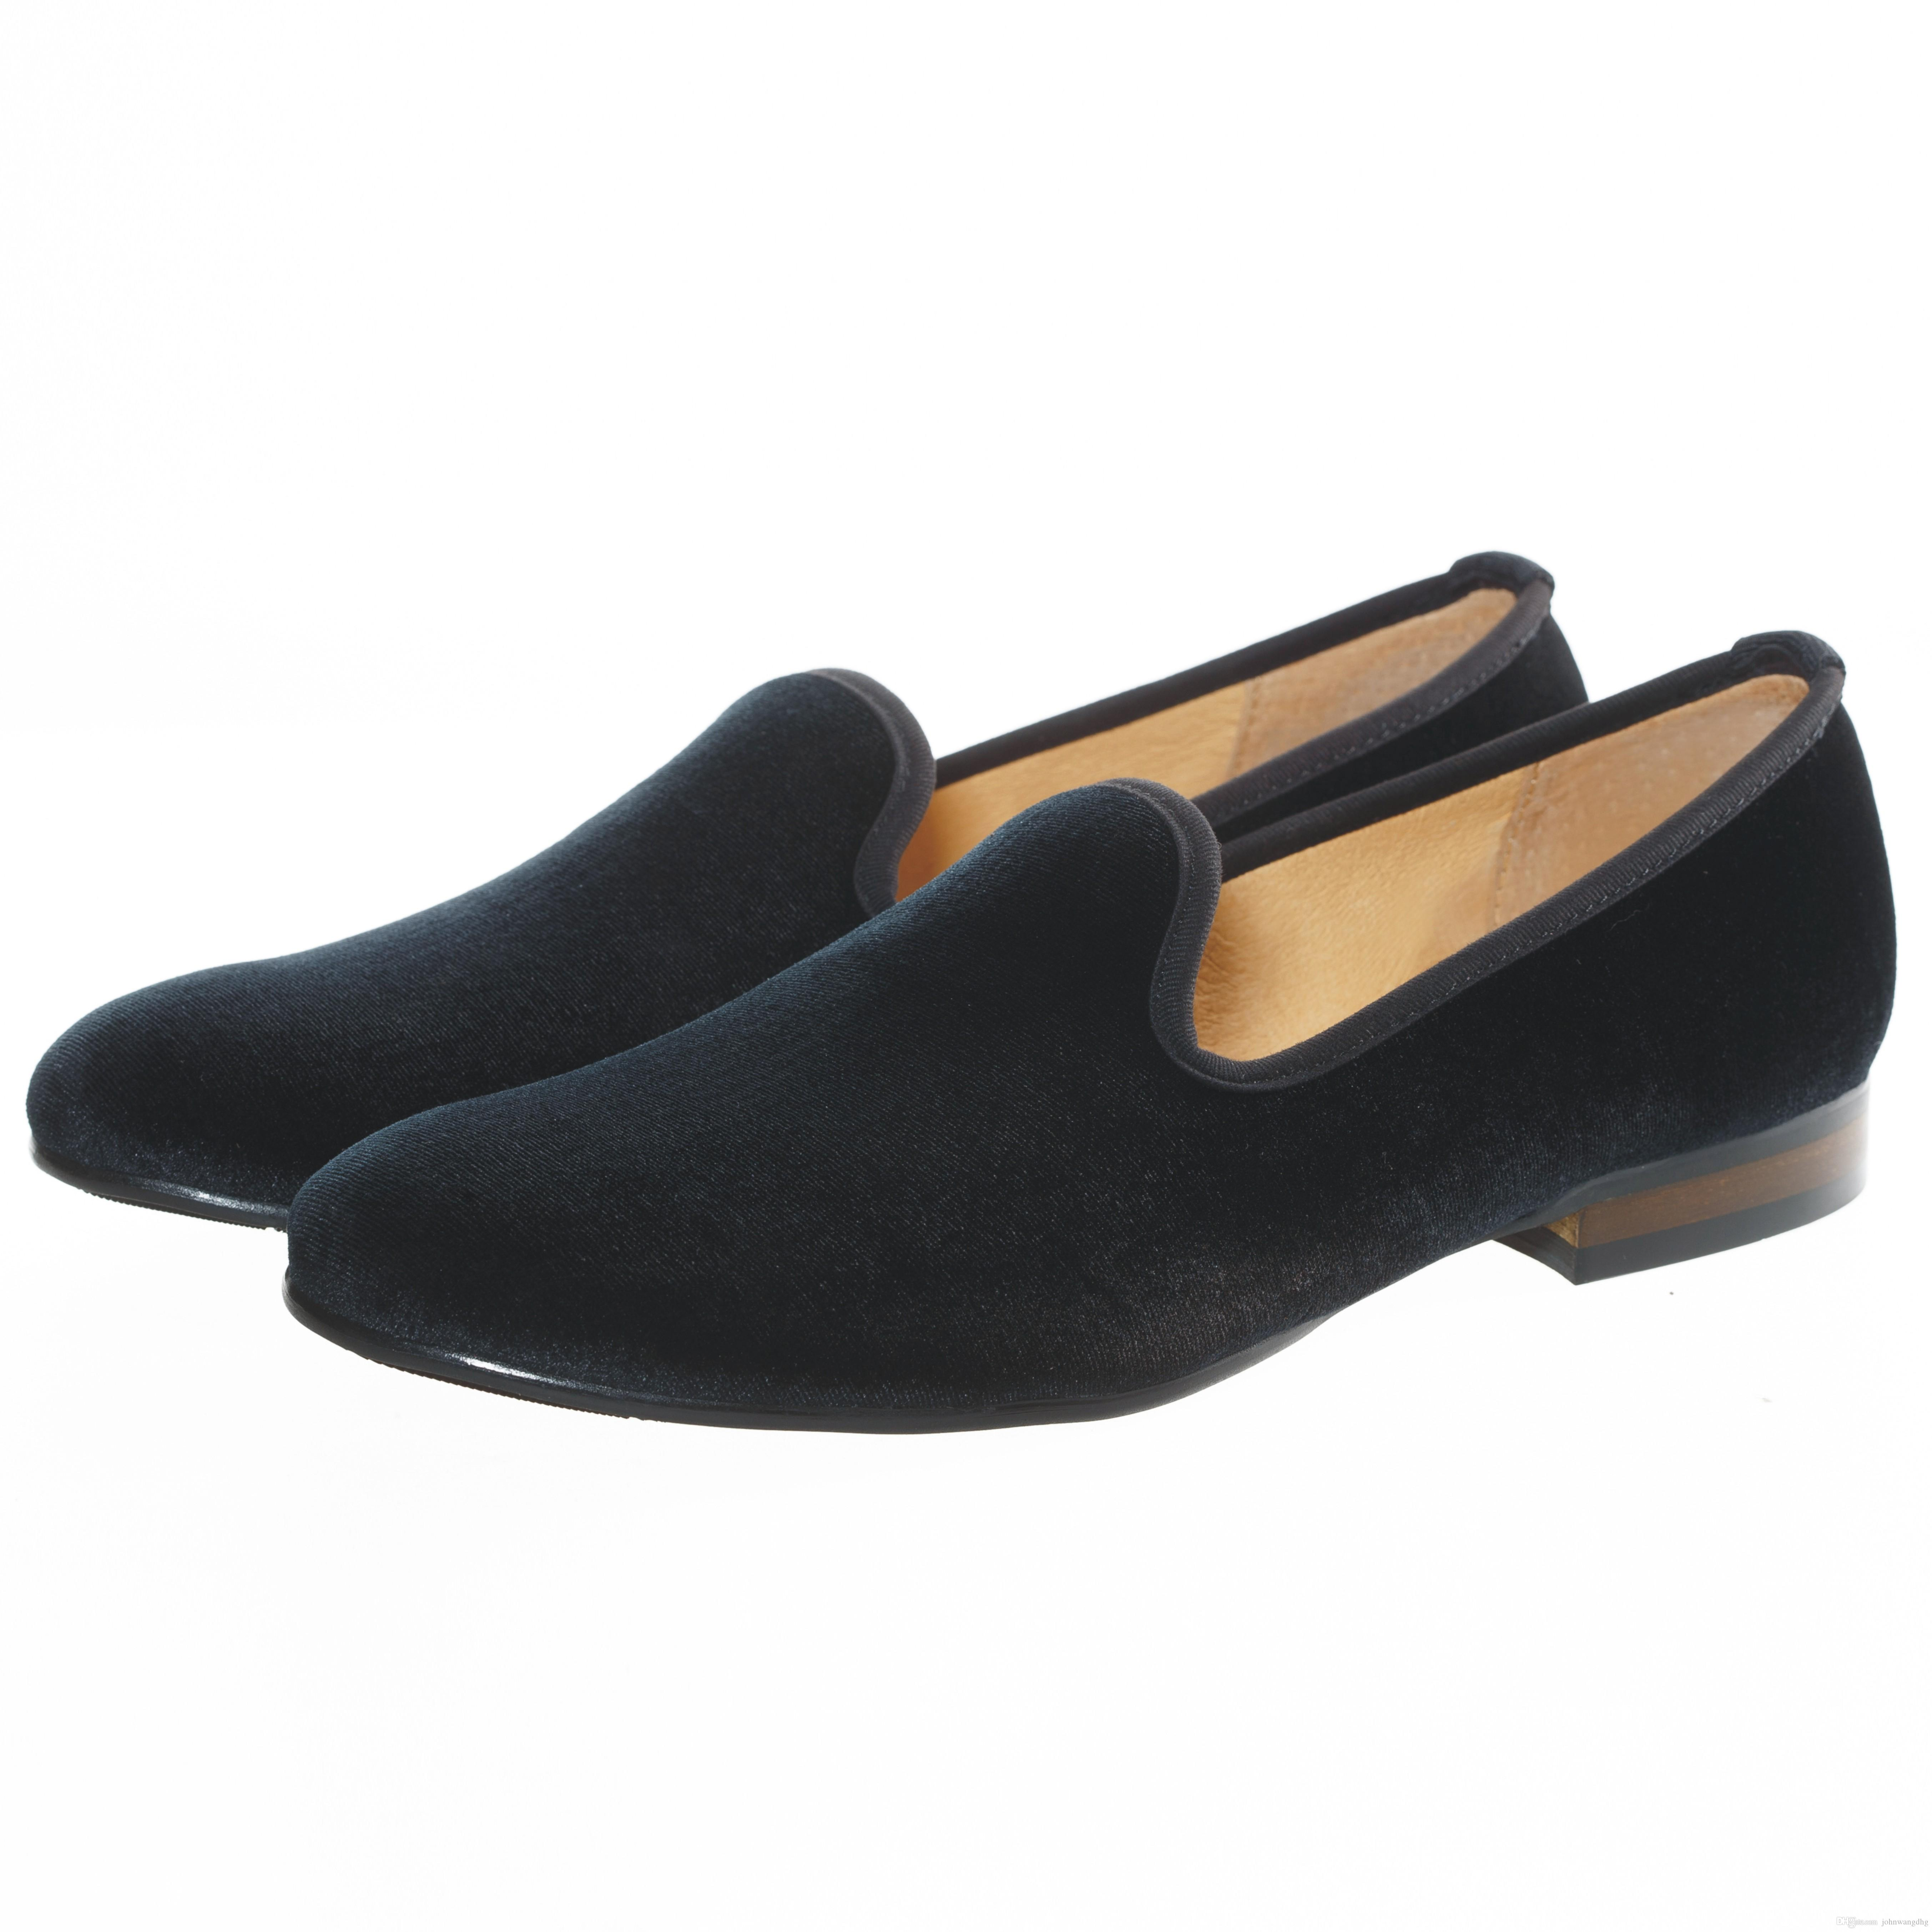 Ballet Wedding Shoes 008 - Ballet Wedding Shoes